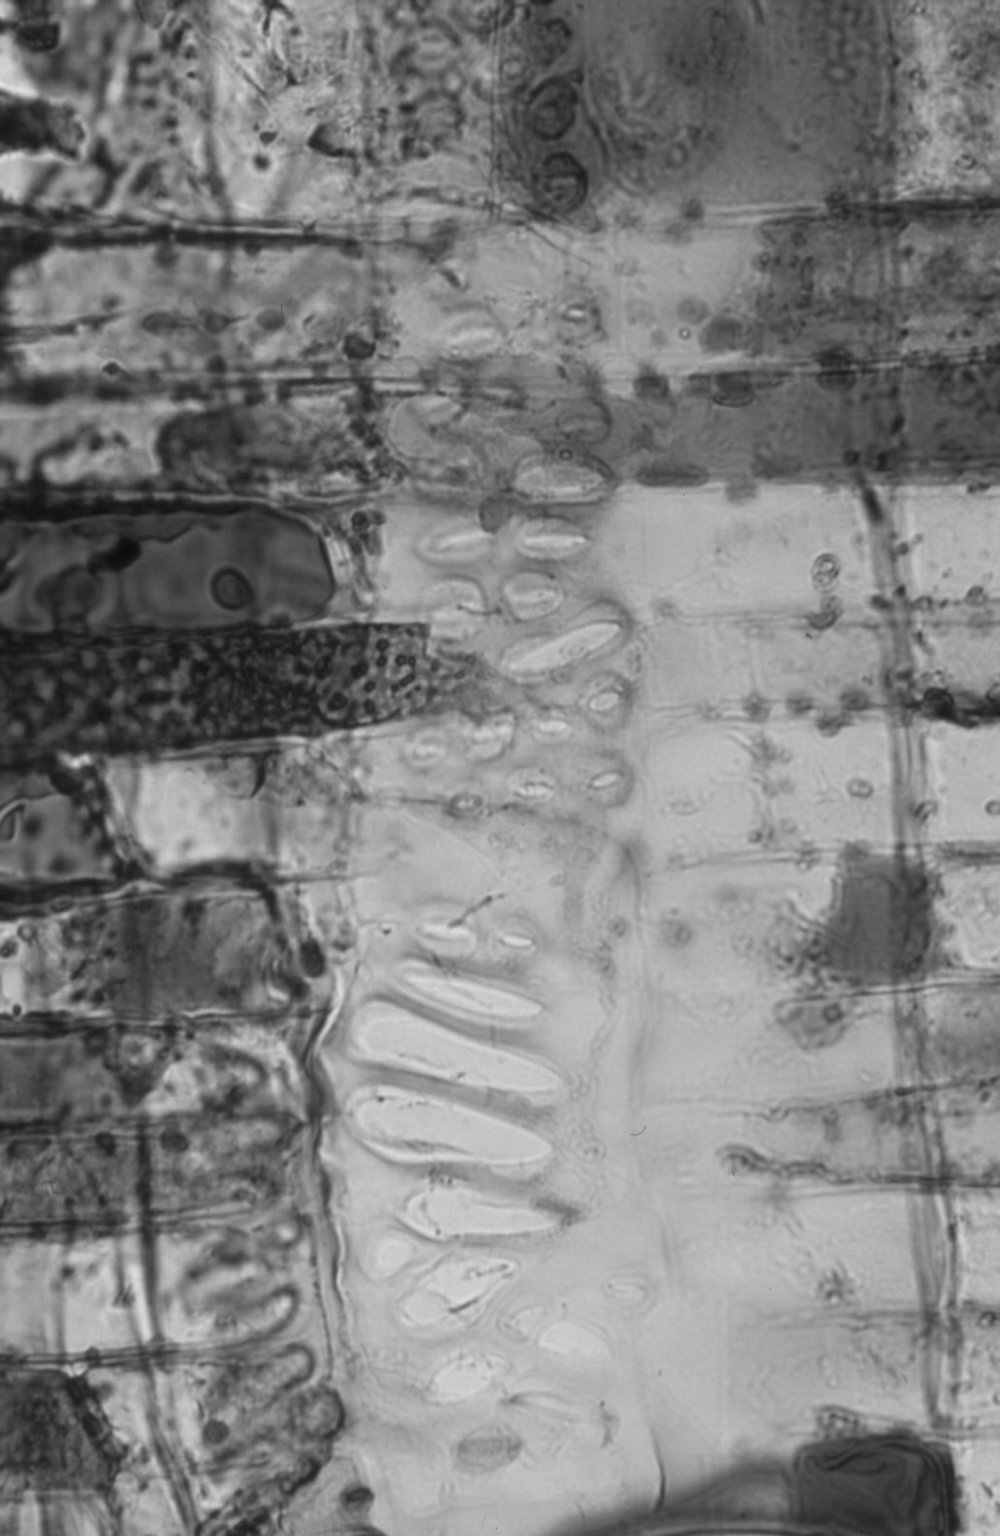 LAURACEAE Cryptocarya oblata